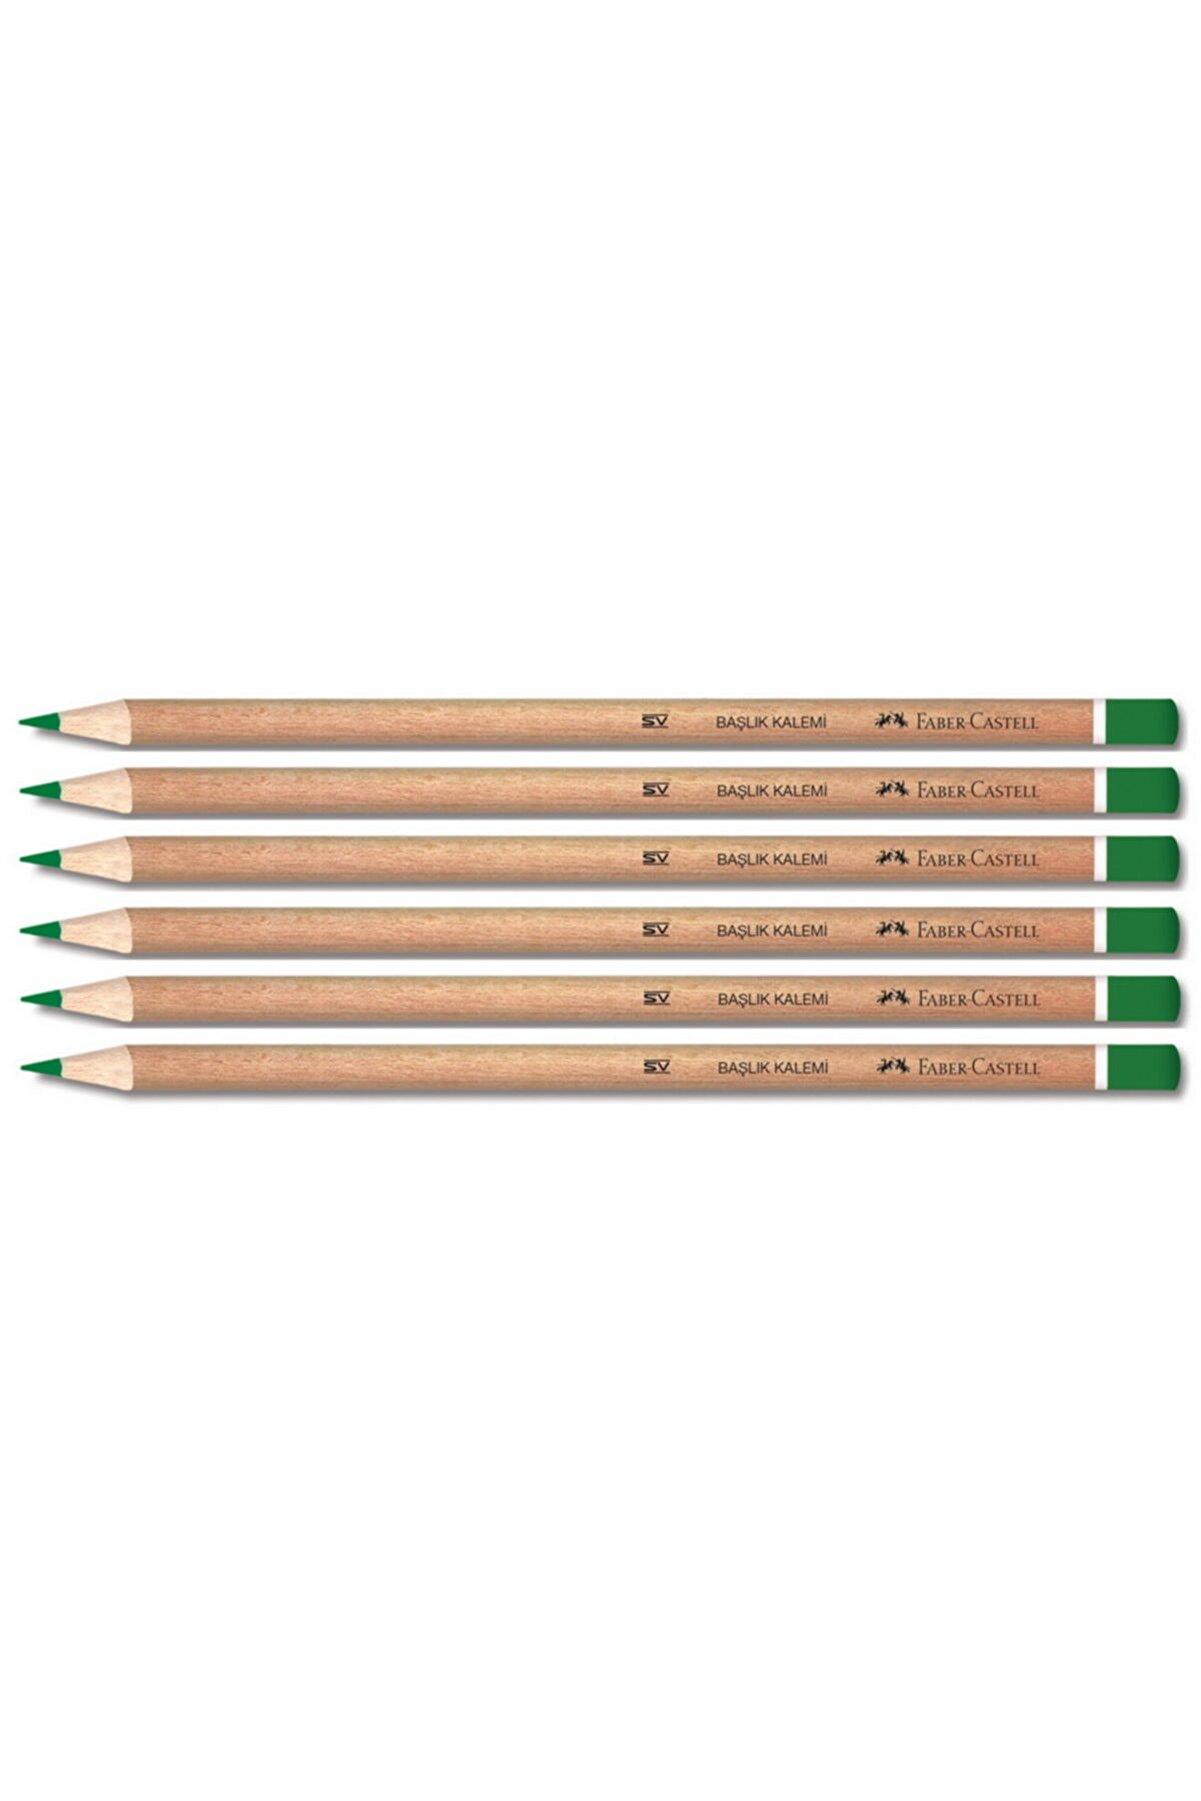 Faber Castell Naturel Yeşil Renkli Kurşun Kalem 6 Lı Paket